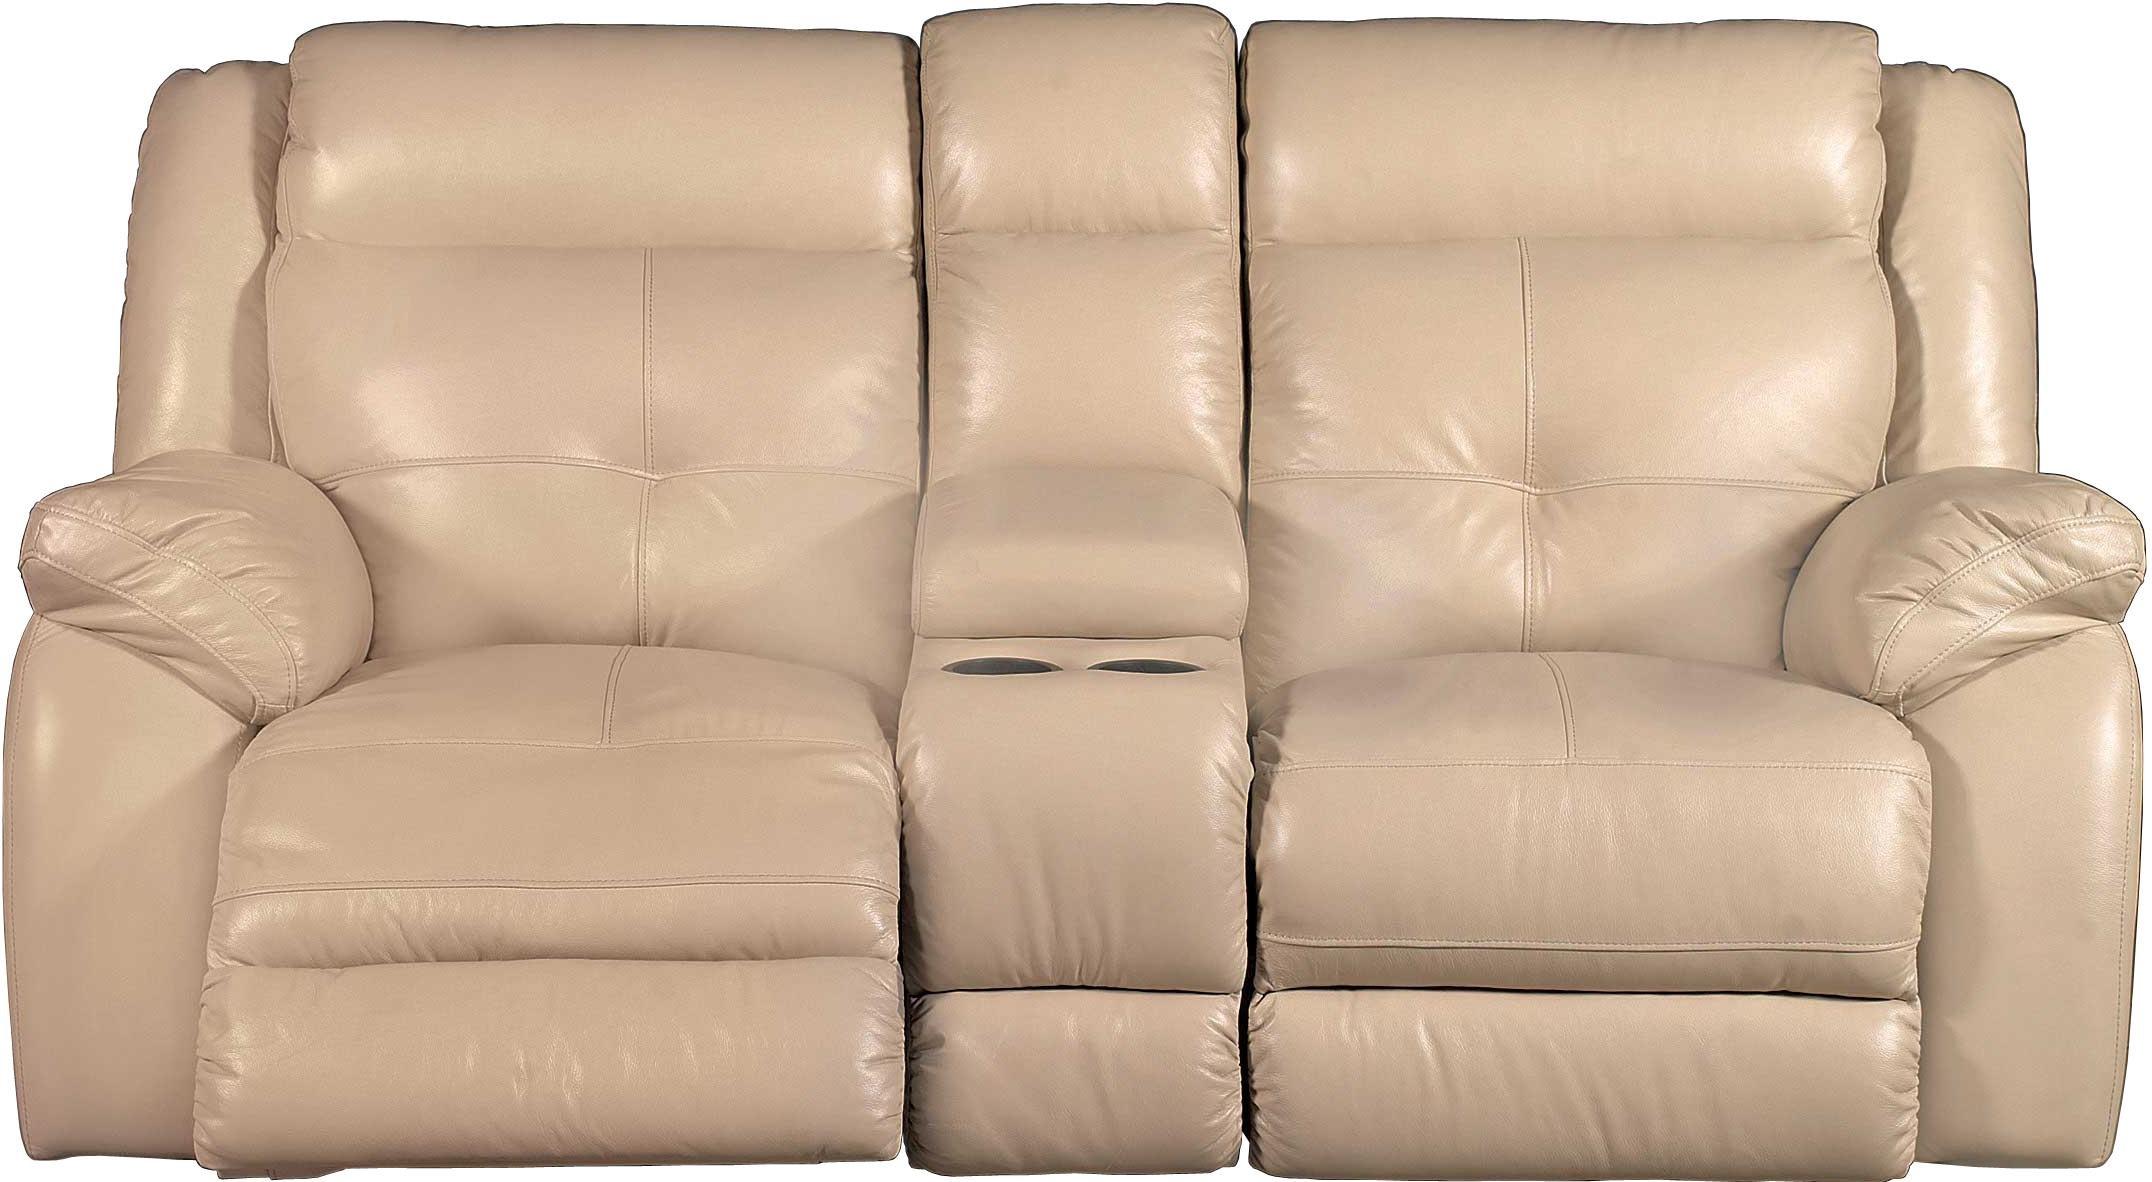 Tan Leather Match Power Reclining Sofa Manual Gliding